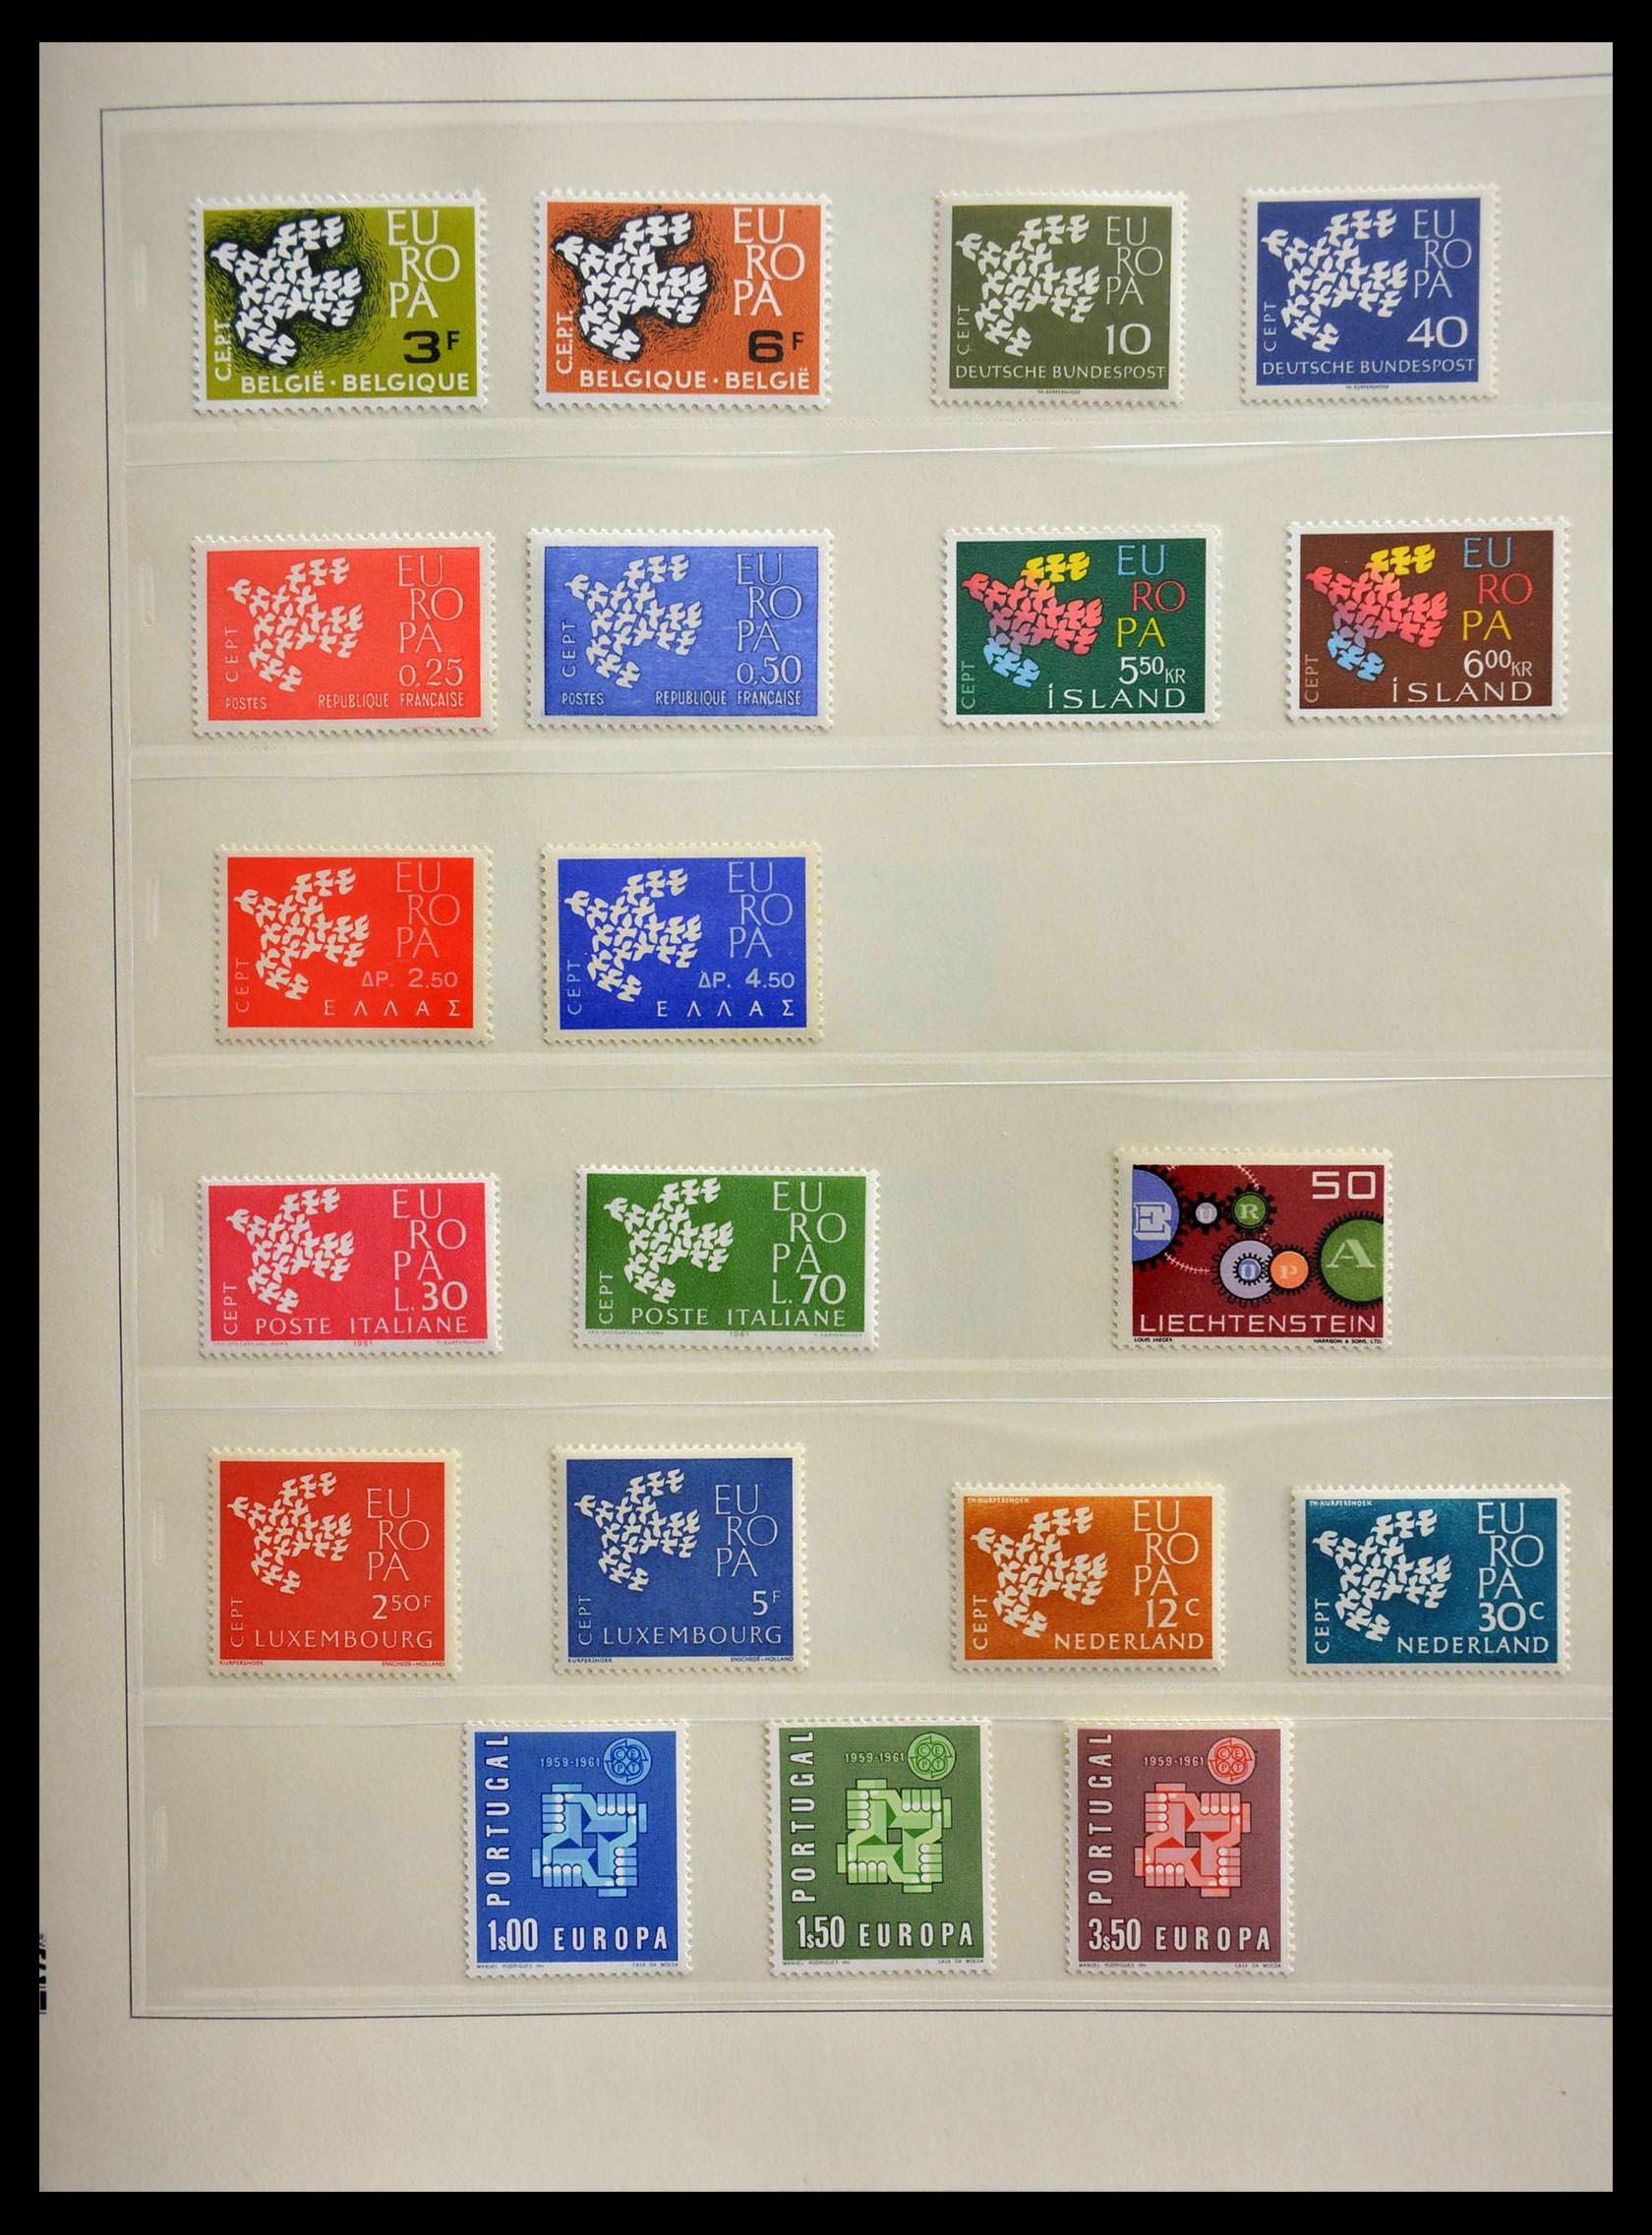 28637 007 - 28637 Europe Cept 1956-2000.